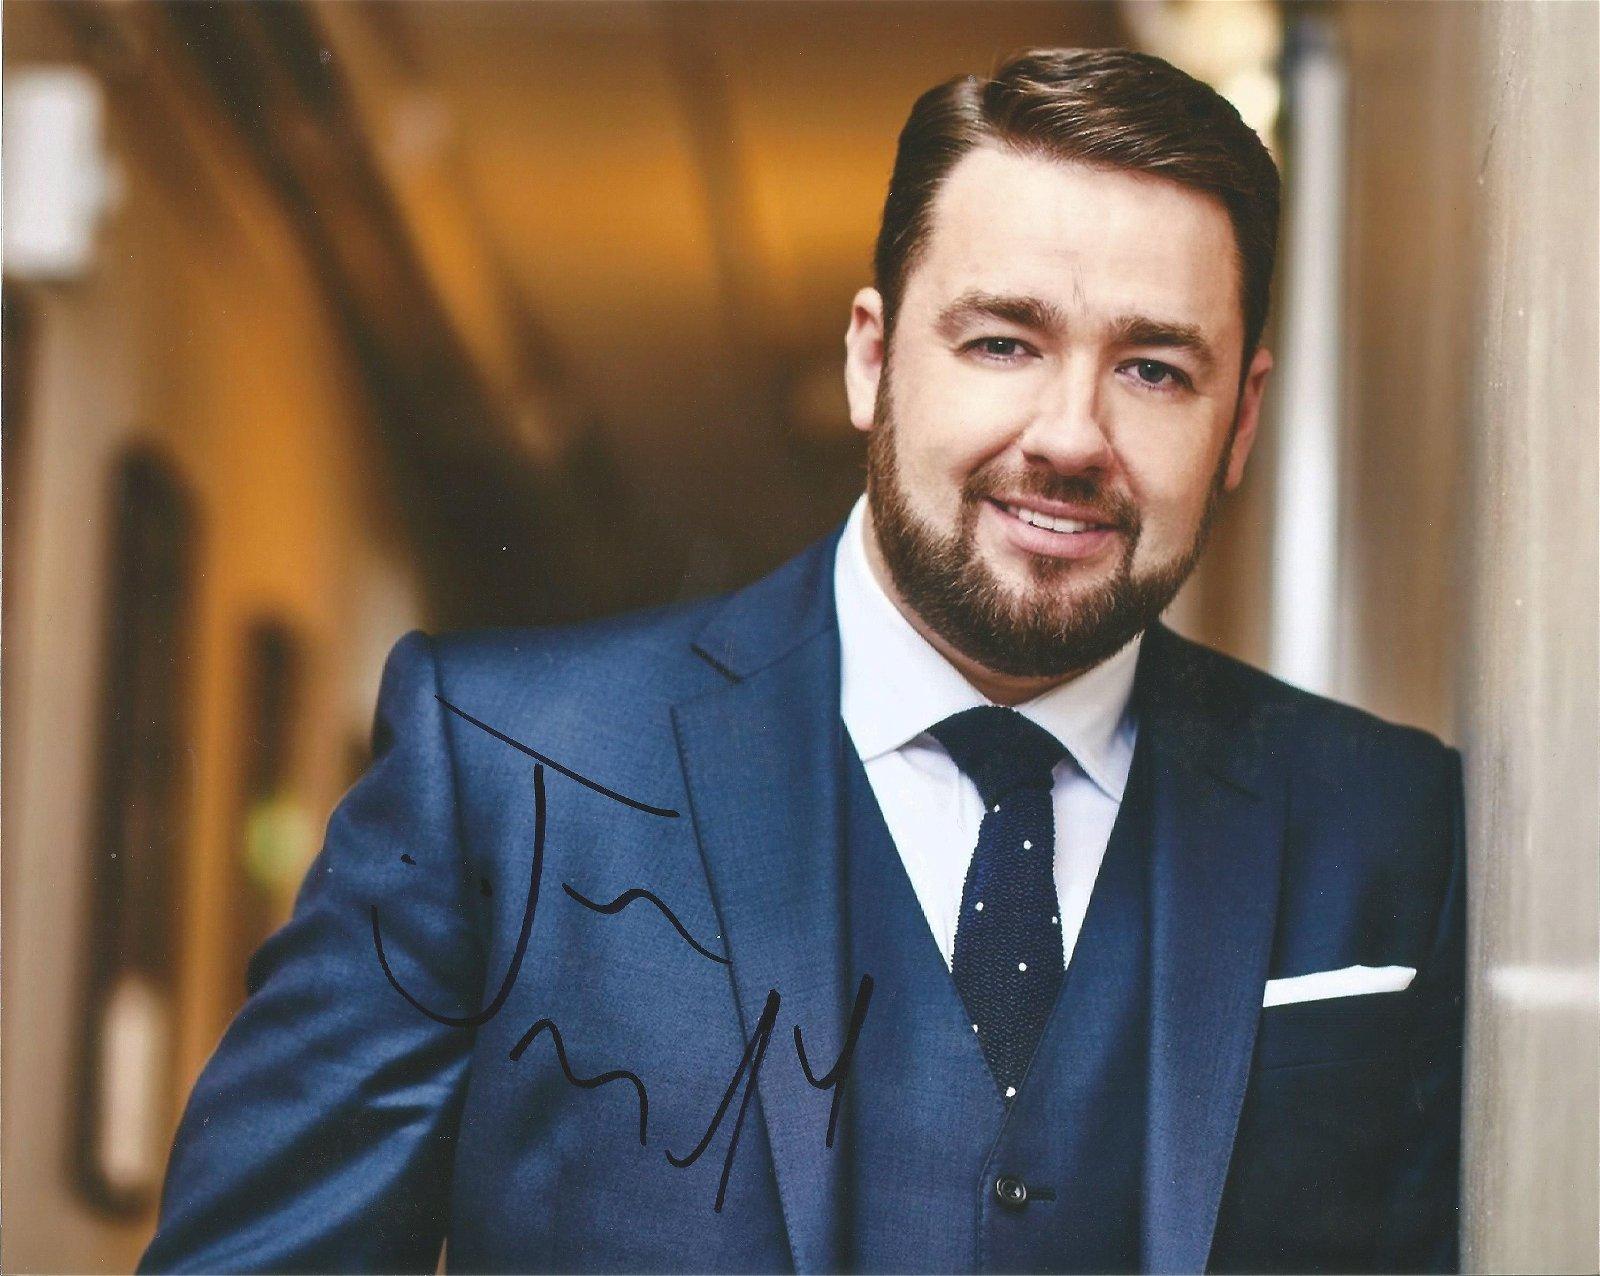 Jason Manford Comedian / Actor Signed 8x10 Photo . Good